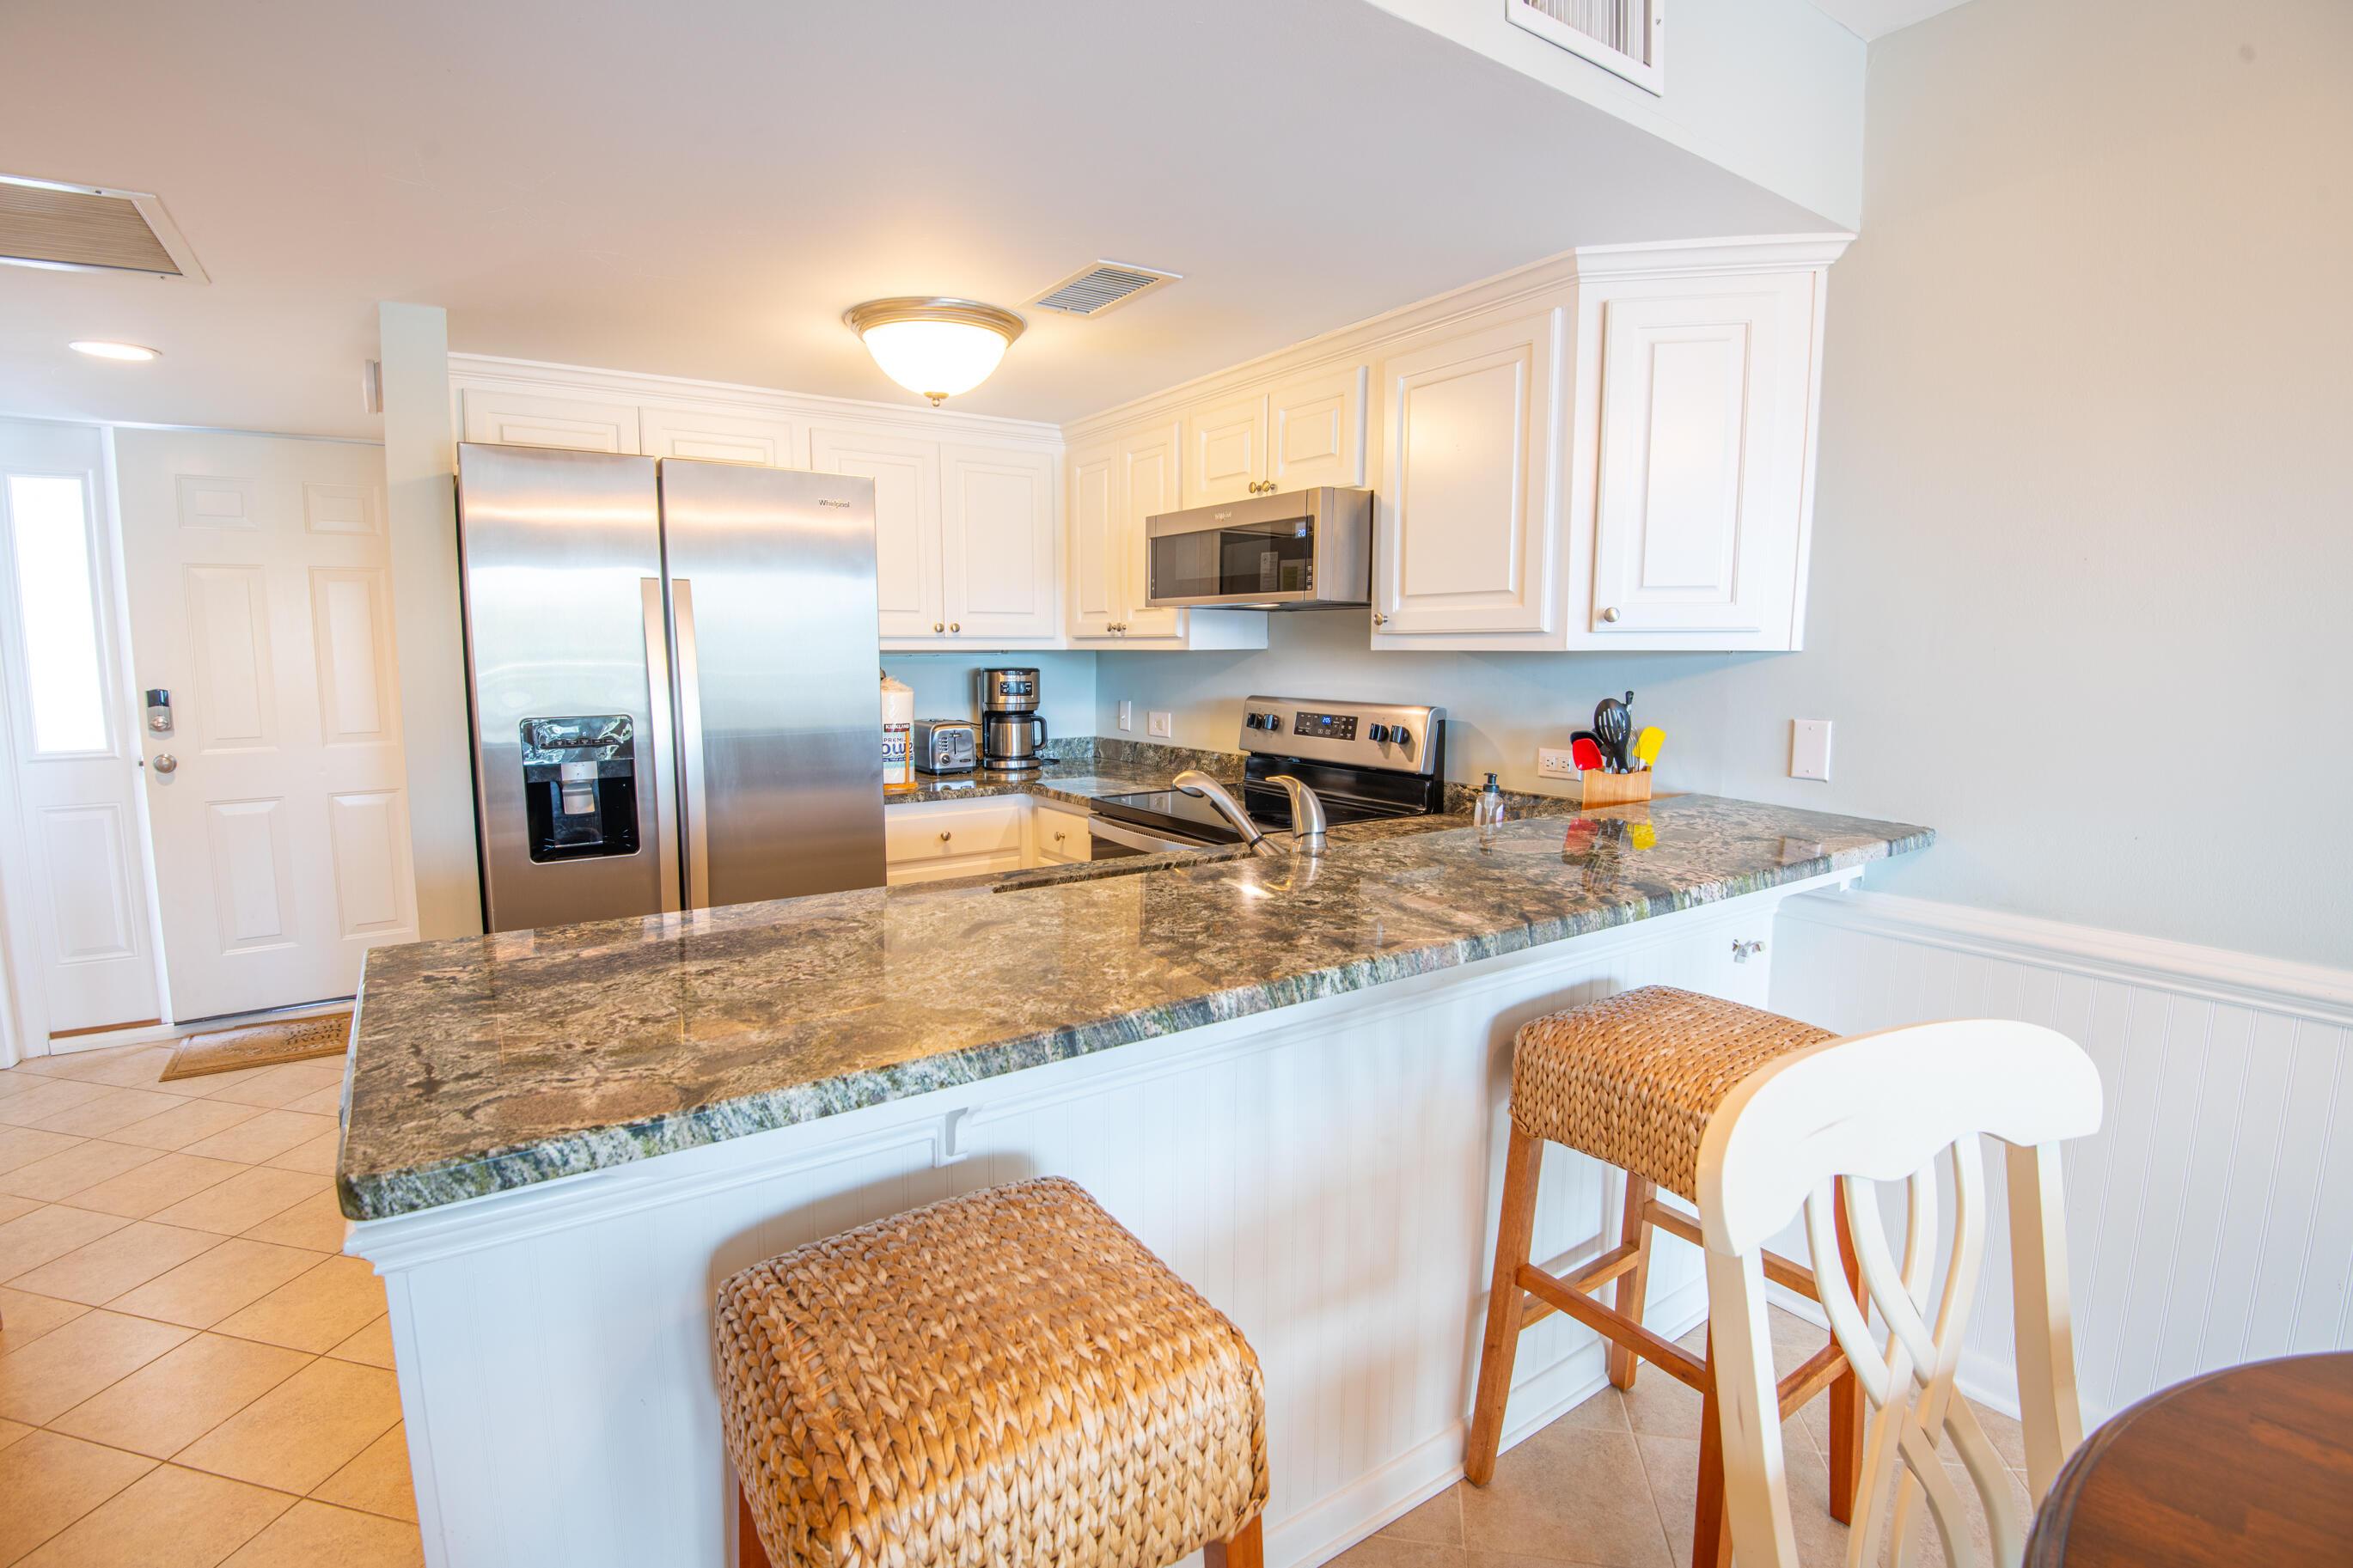 Atrium Villas Homes For Sale - 2935 Atrium Villa, Seabrook Island, SC - 35